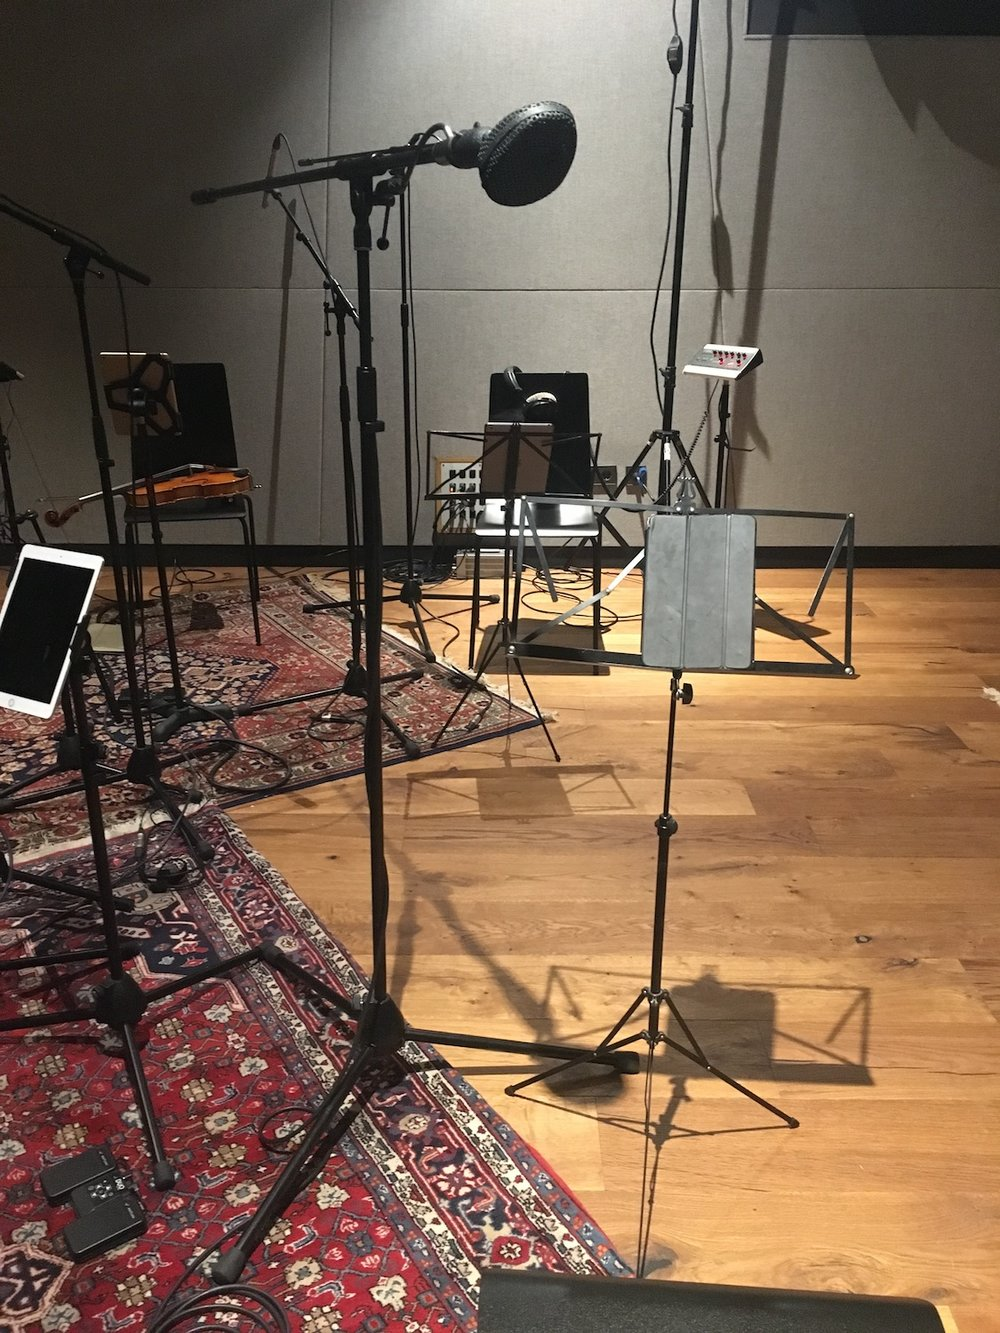 Yung-Nnelg-Red-Bull-Studios-uncut-coles-4038-ribbon-microphone-The-Wong-Janice.jpg